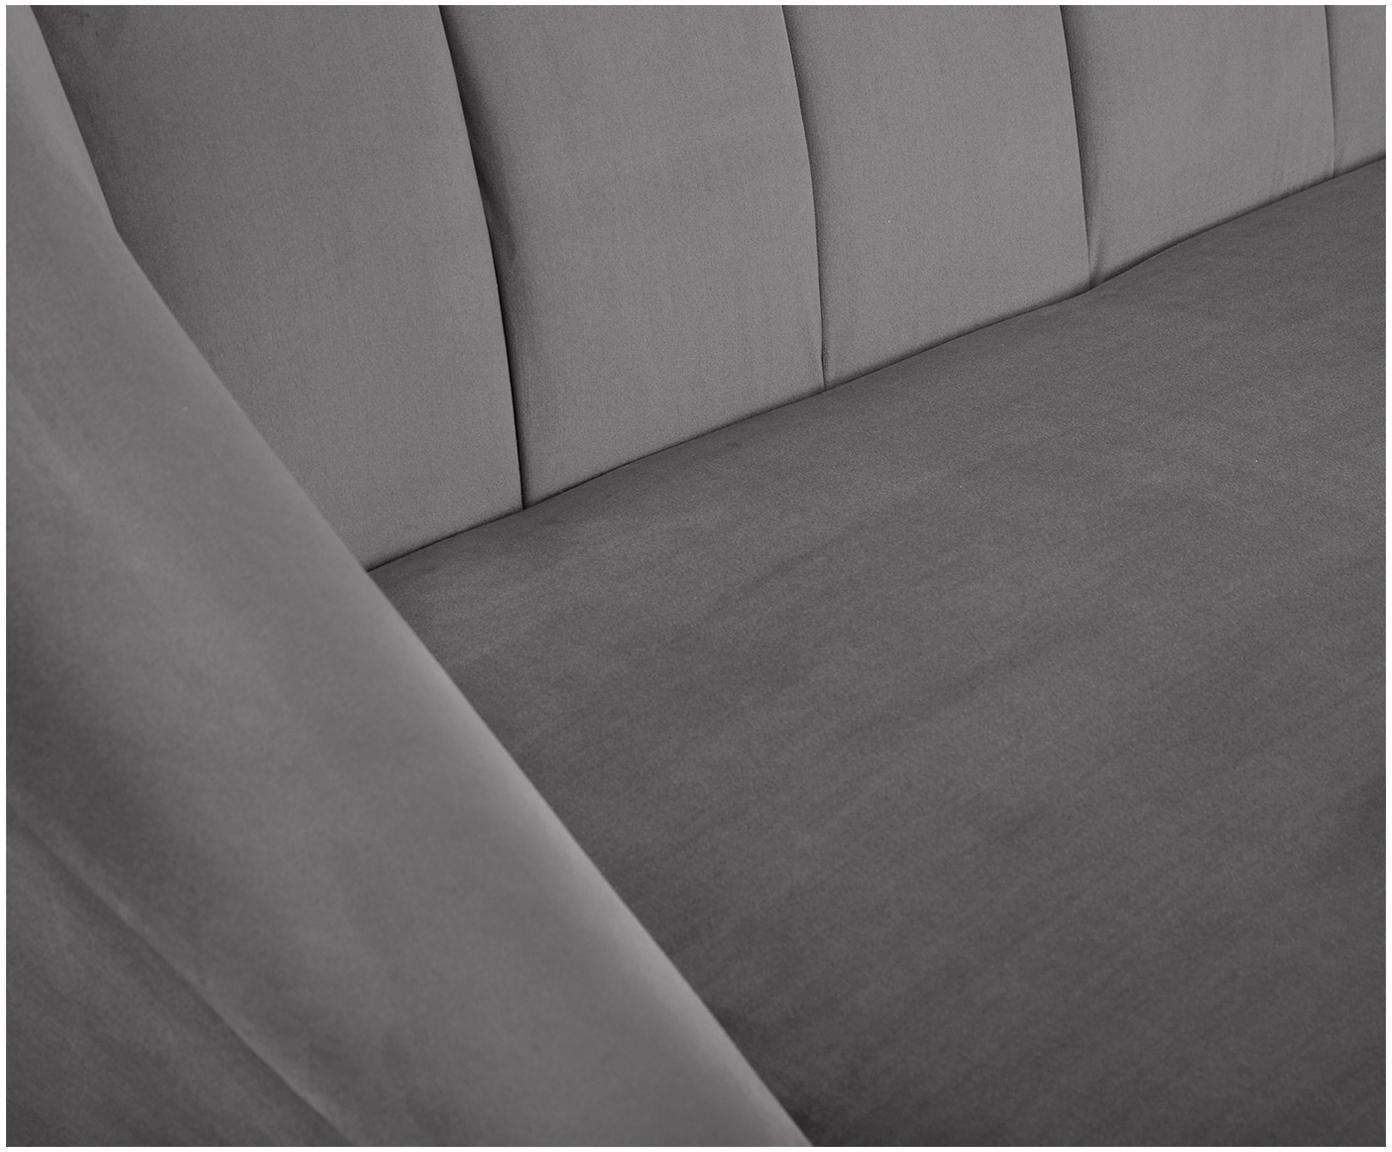 Fluwelen bank Cora (3-zits), Bekleding: fluweel (polyester), Frame: grenenhout, Poten: rubberhout, Bekleding: lichtgrijs. Poten: donker gelakt rubberhout, 192 x 74 cm